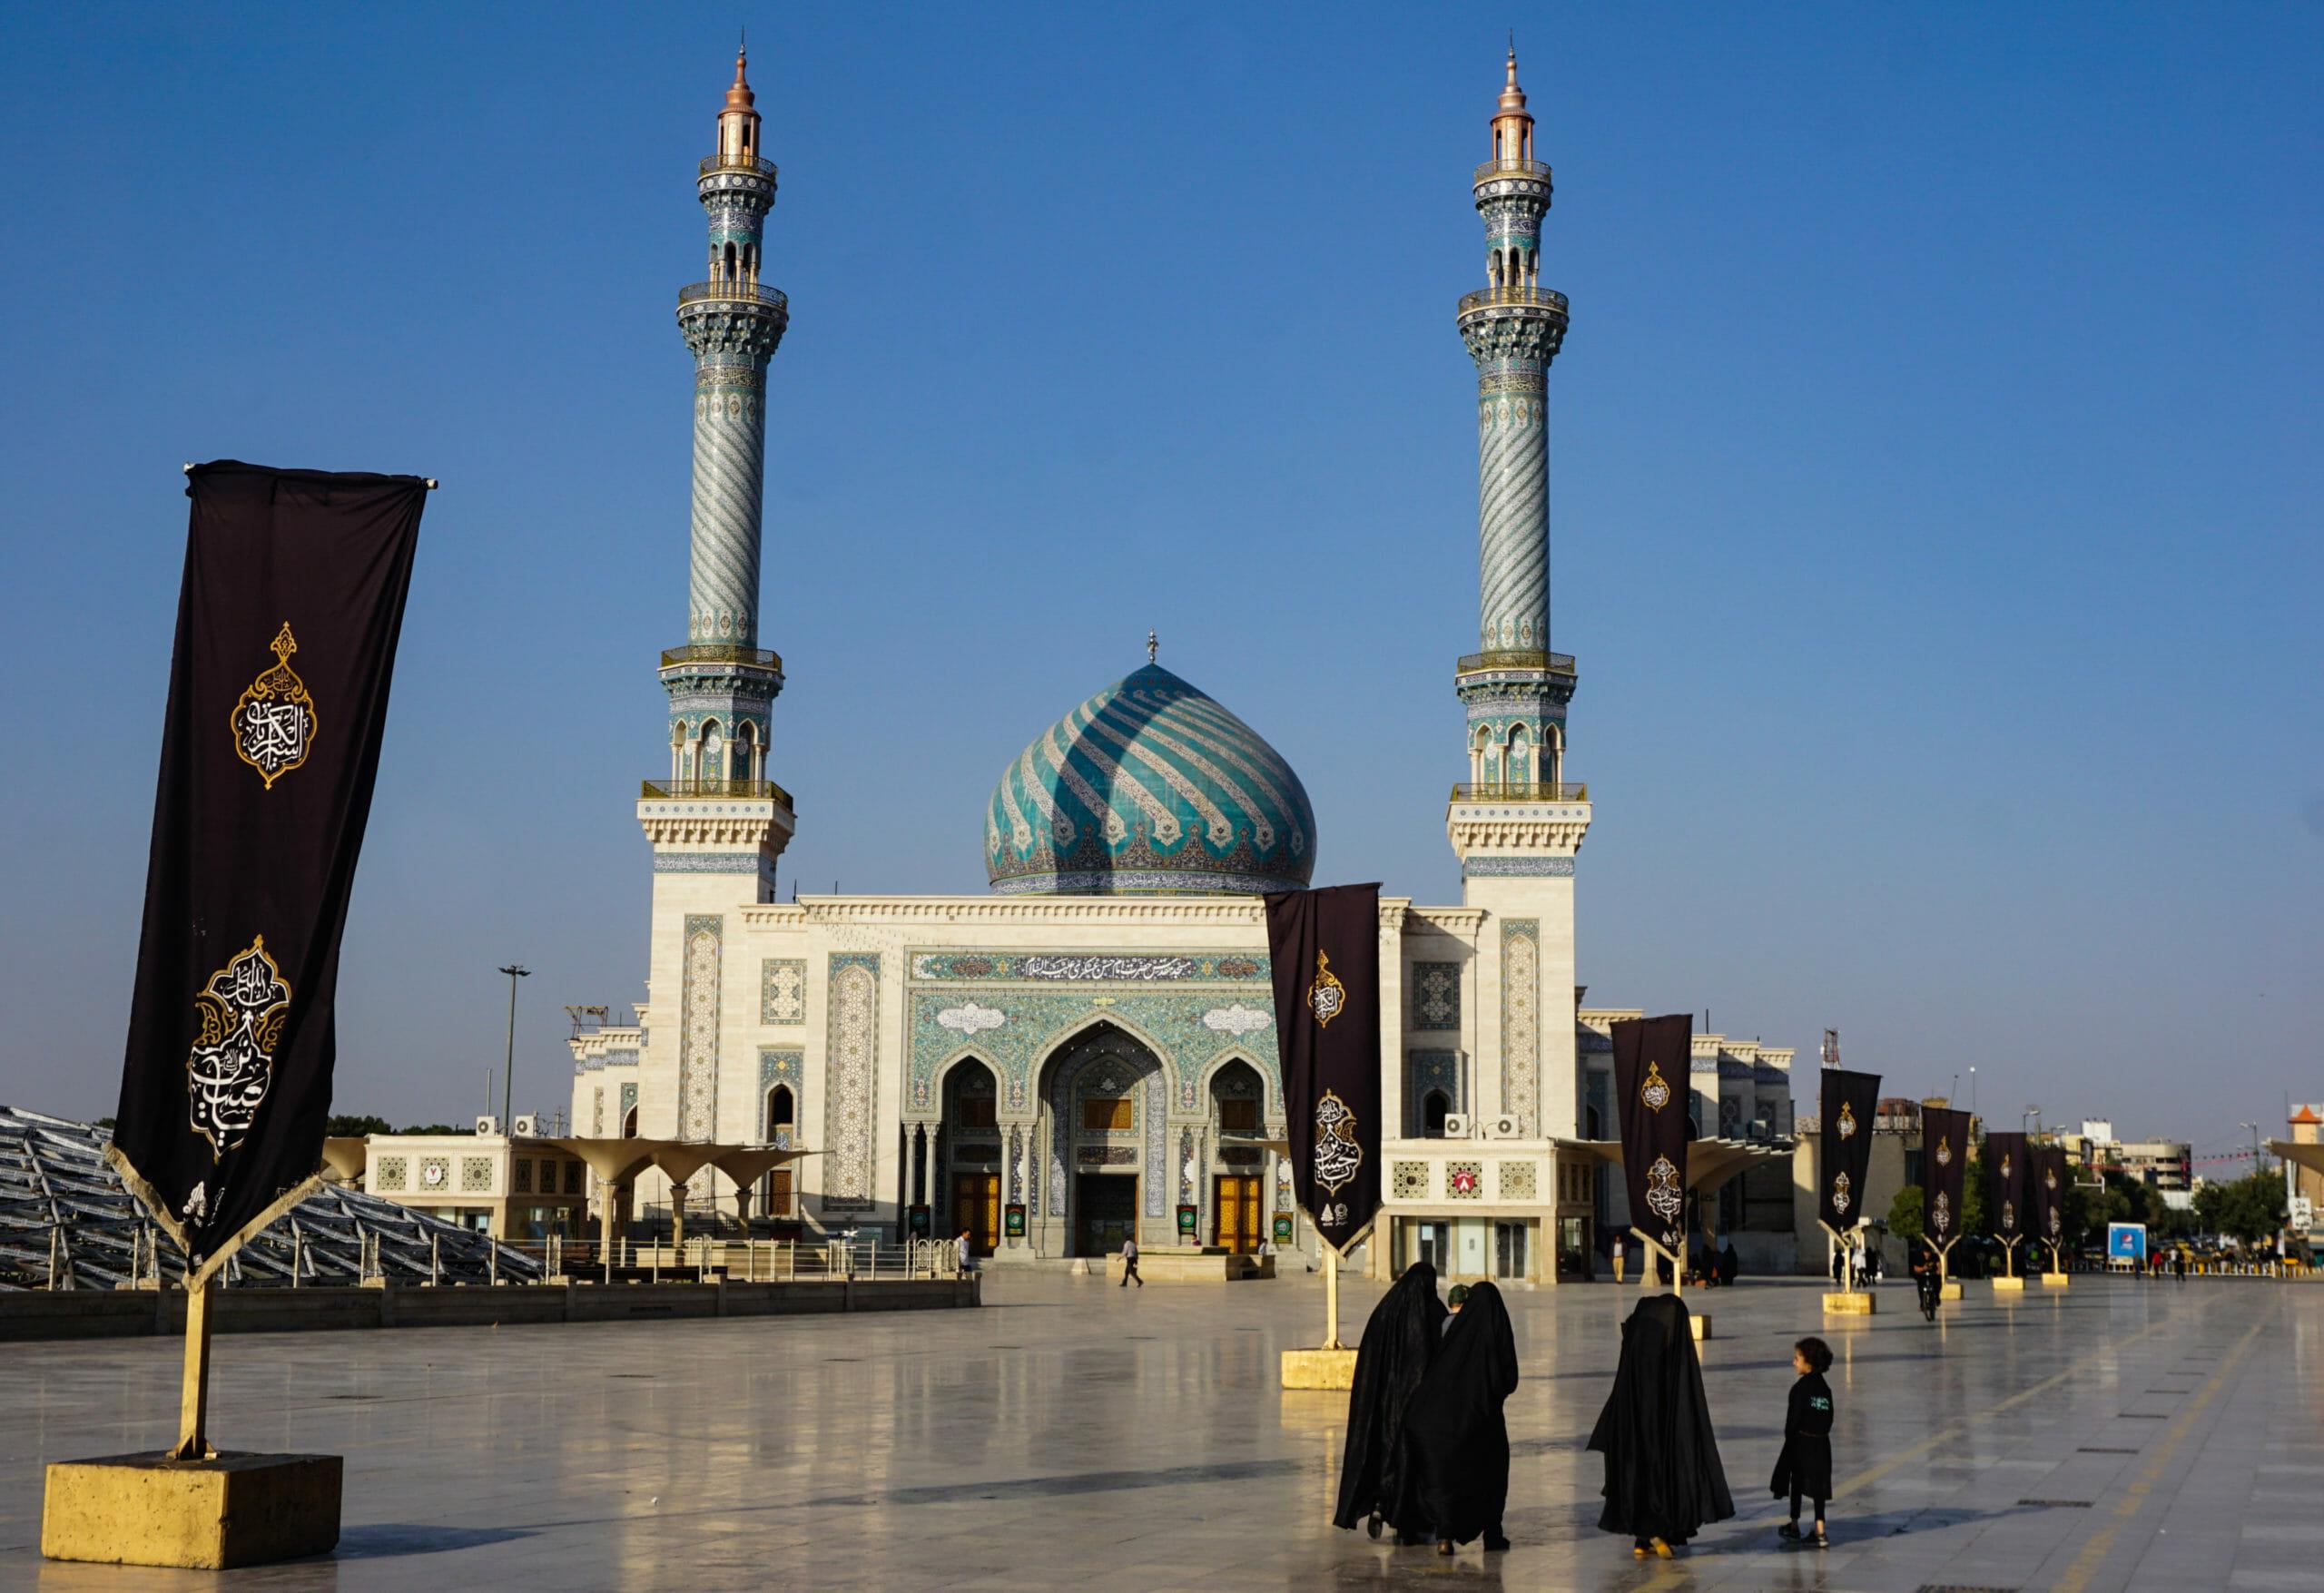 Read more about the article FAKTA: Profetens død skabte to trosretninger i islam